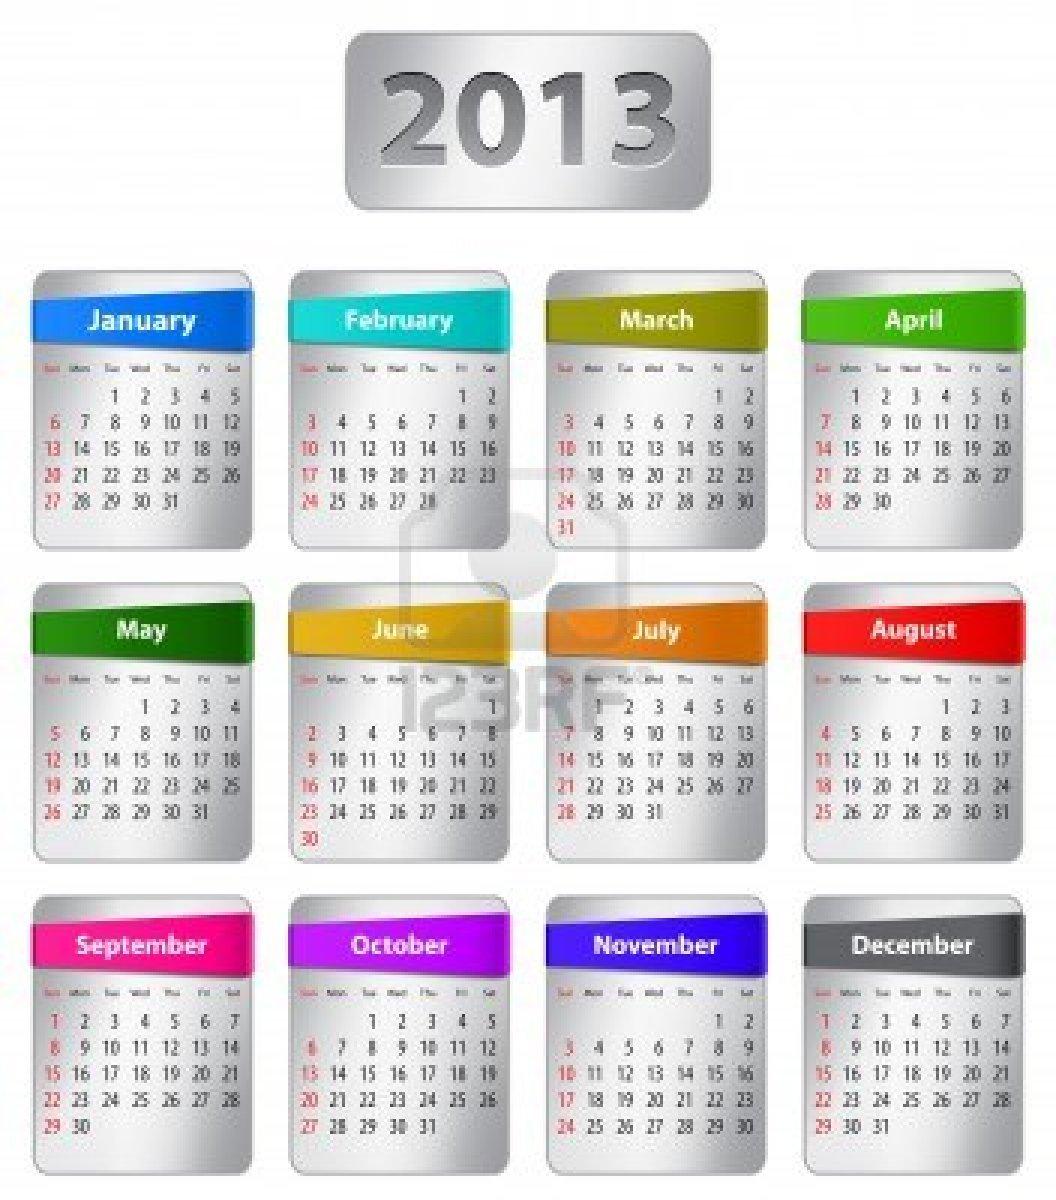 2013 Year Calendar Printable